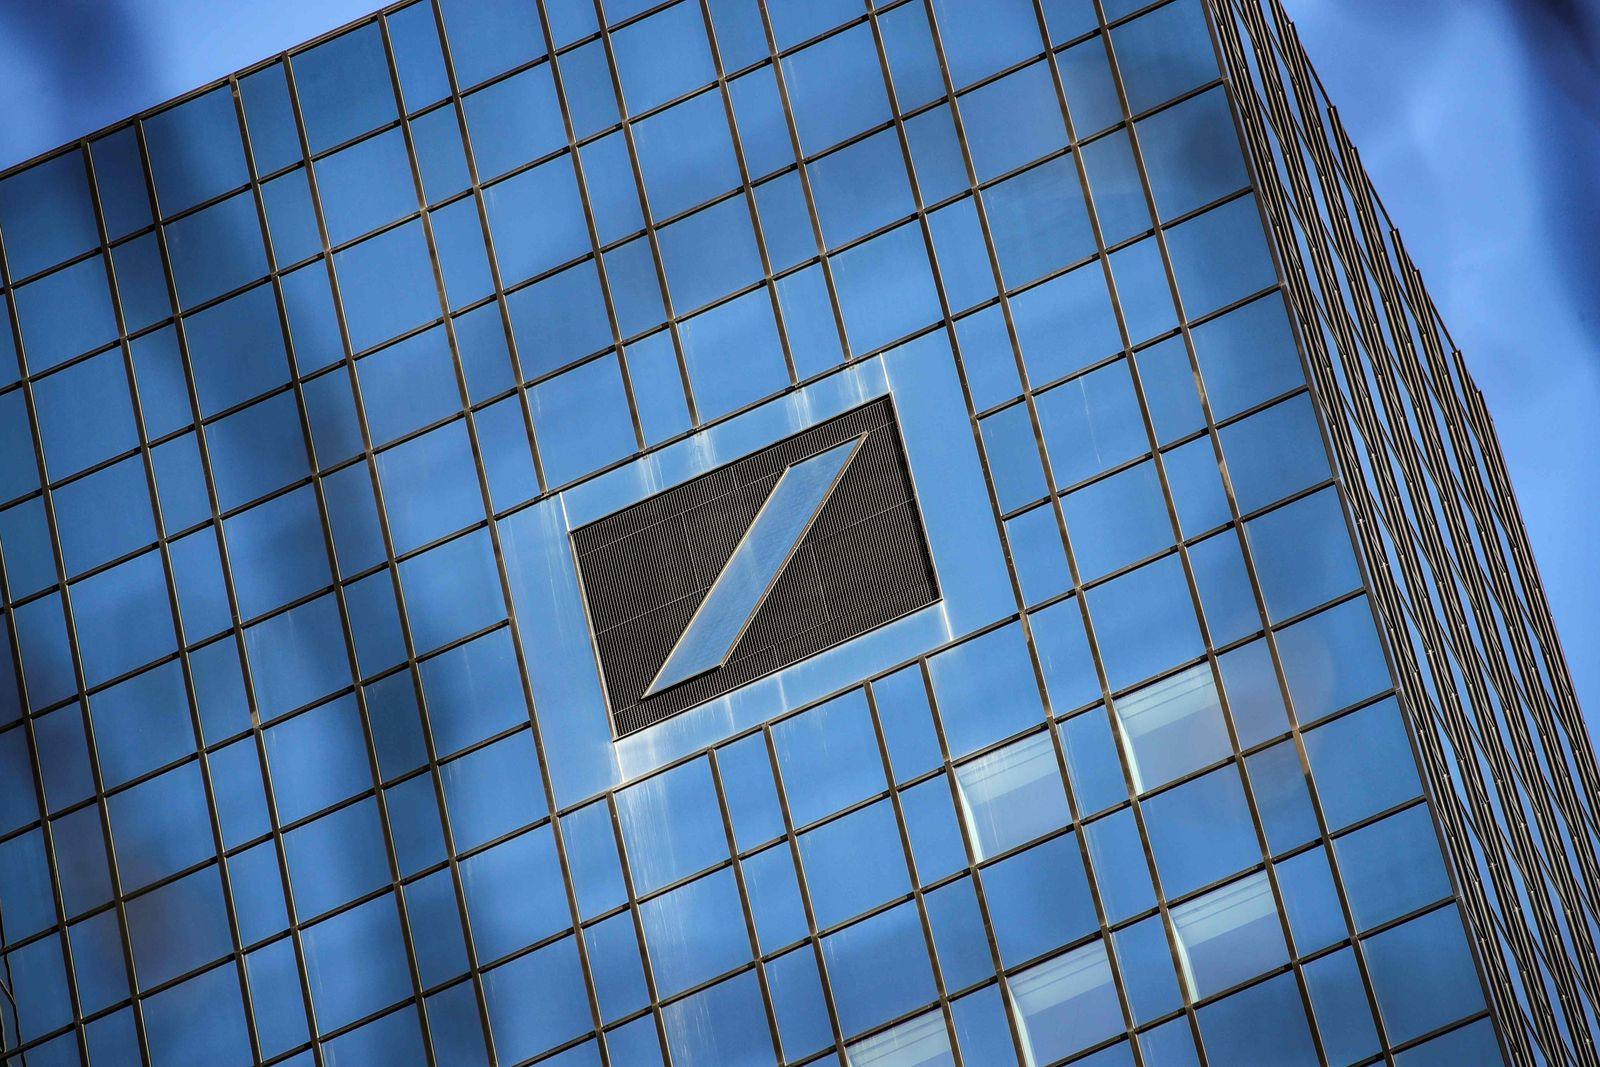 GERMANY-ECONOMY-FINANCE-BANKING-RESULTS-DEUTSCHE BANK